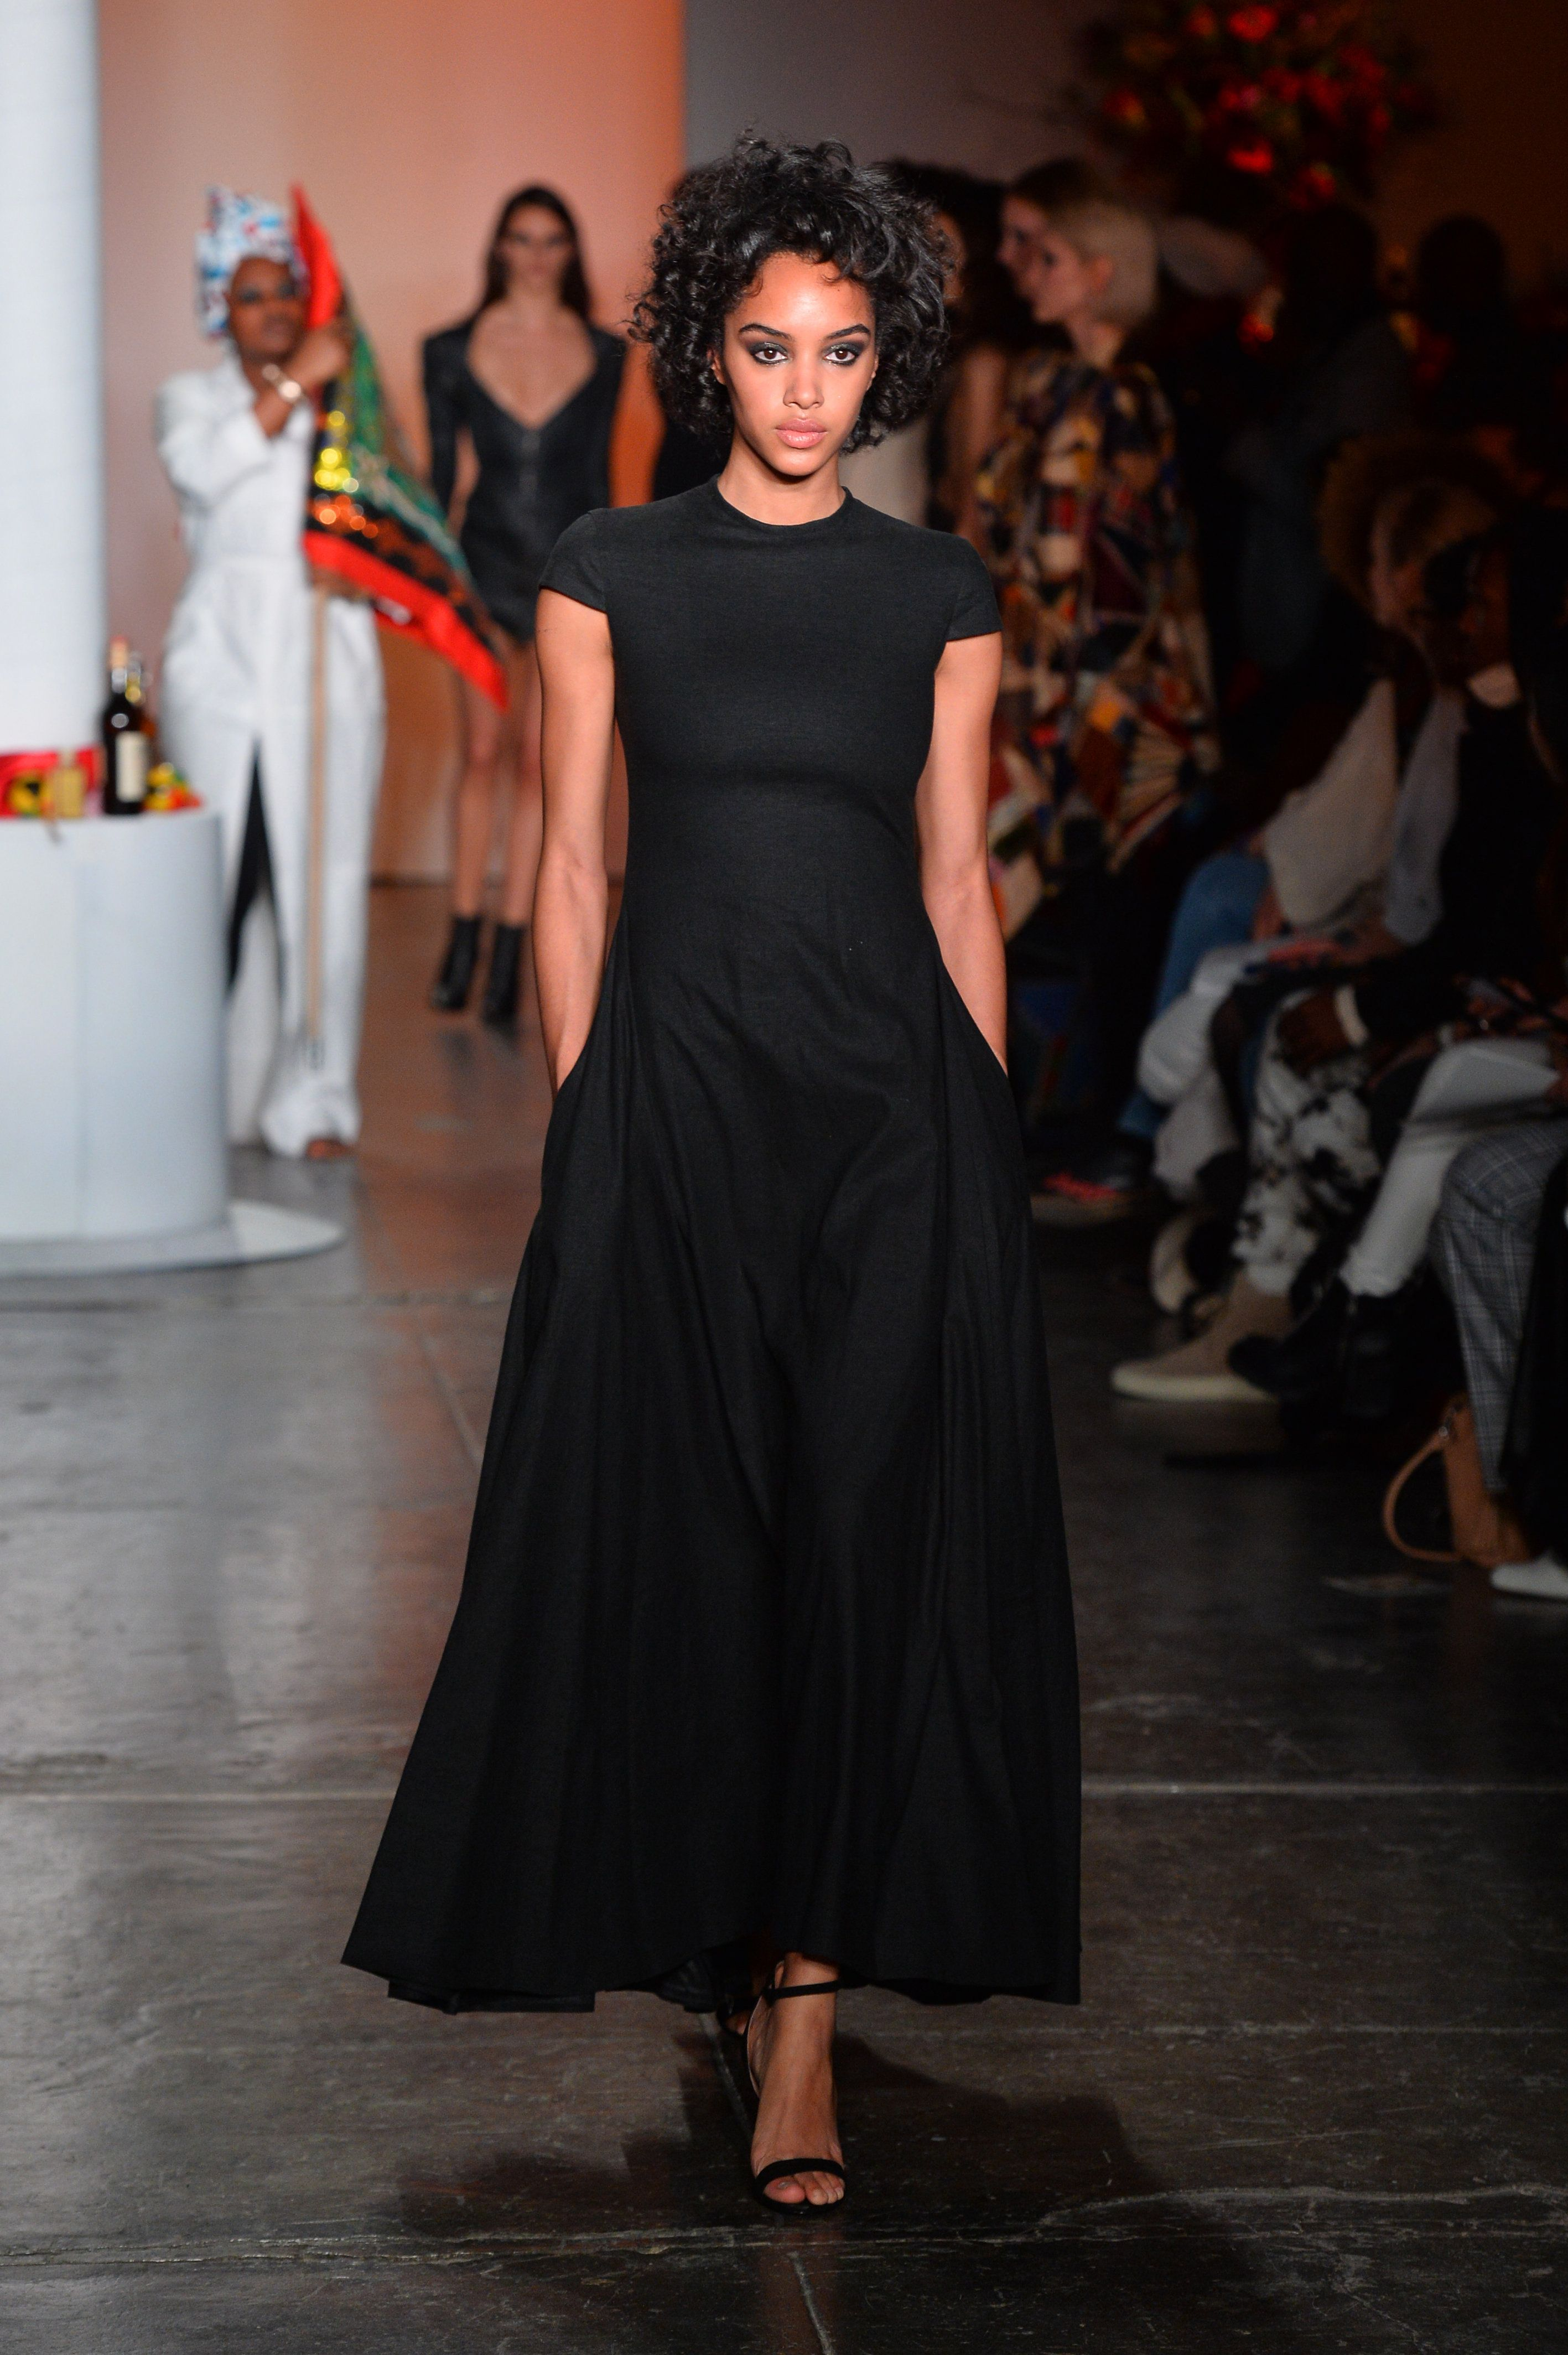 Pinterest Fashion York Mode robe models Week Black New Dresses PYHzHwqg aadb94e9165